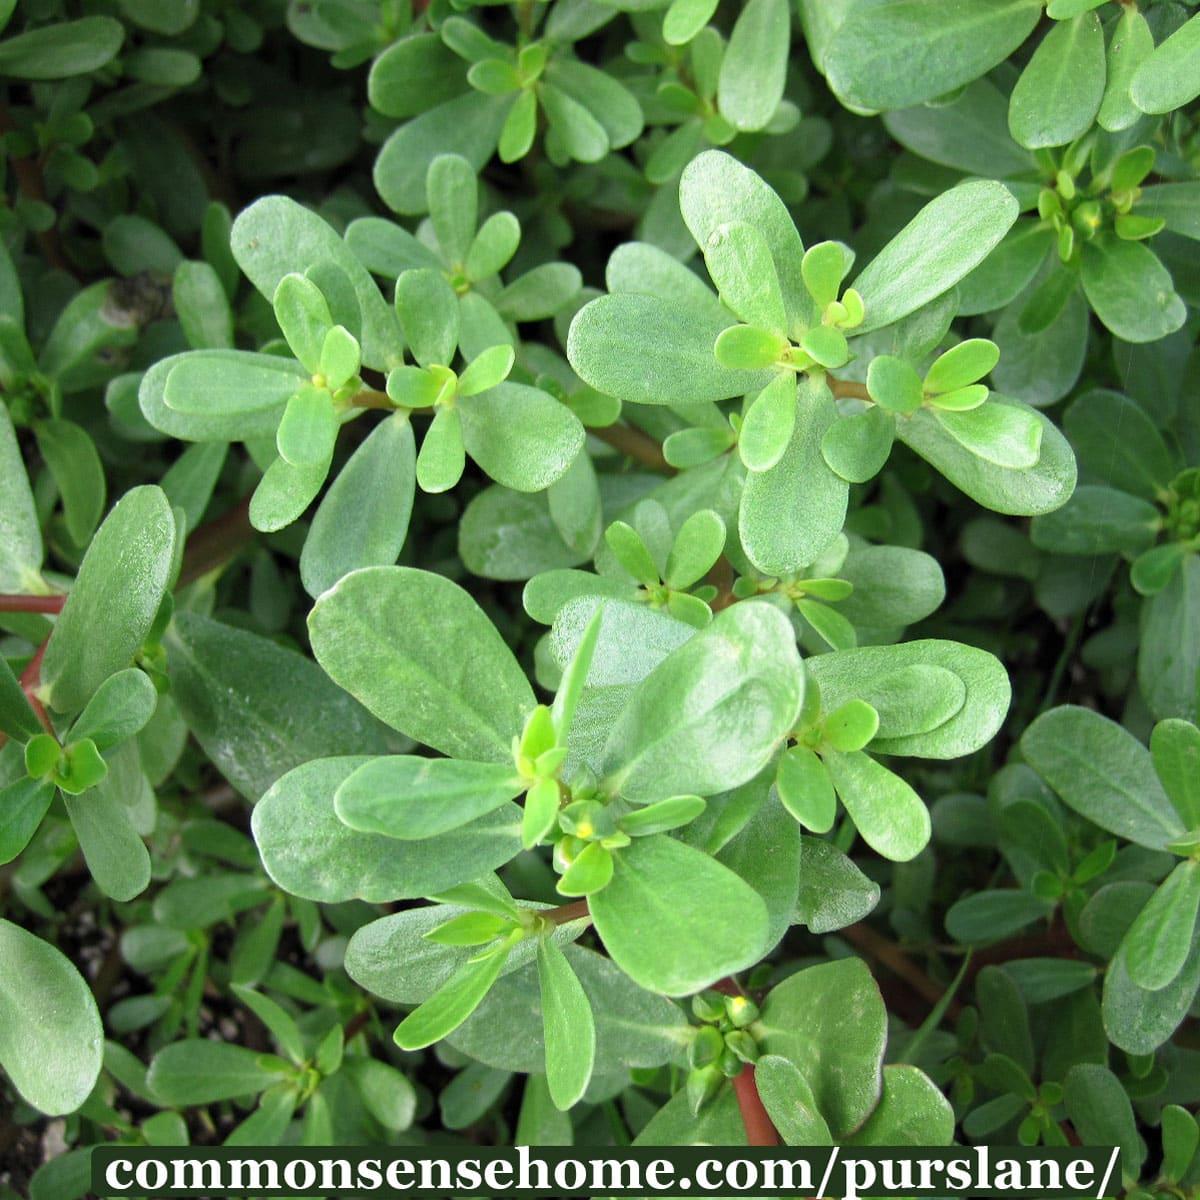 purslane-plant---Portulaca-oleracea